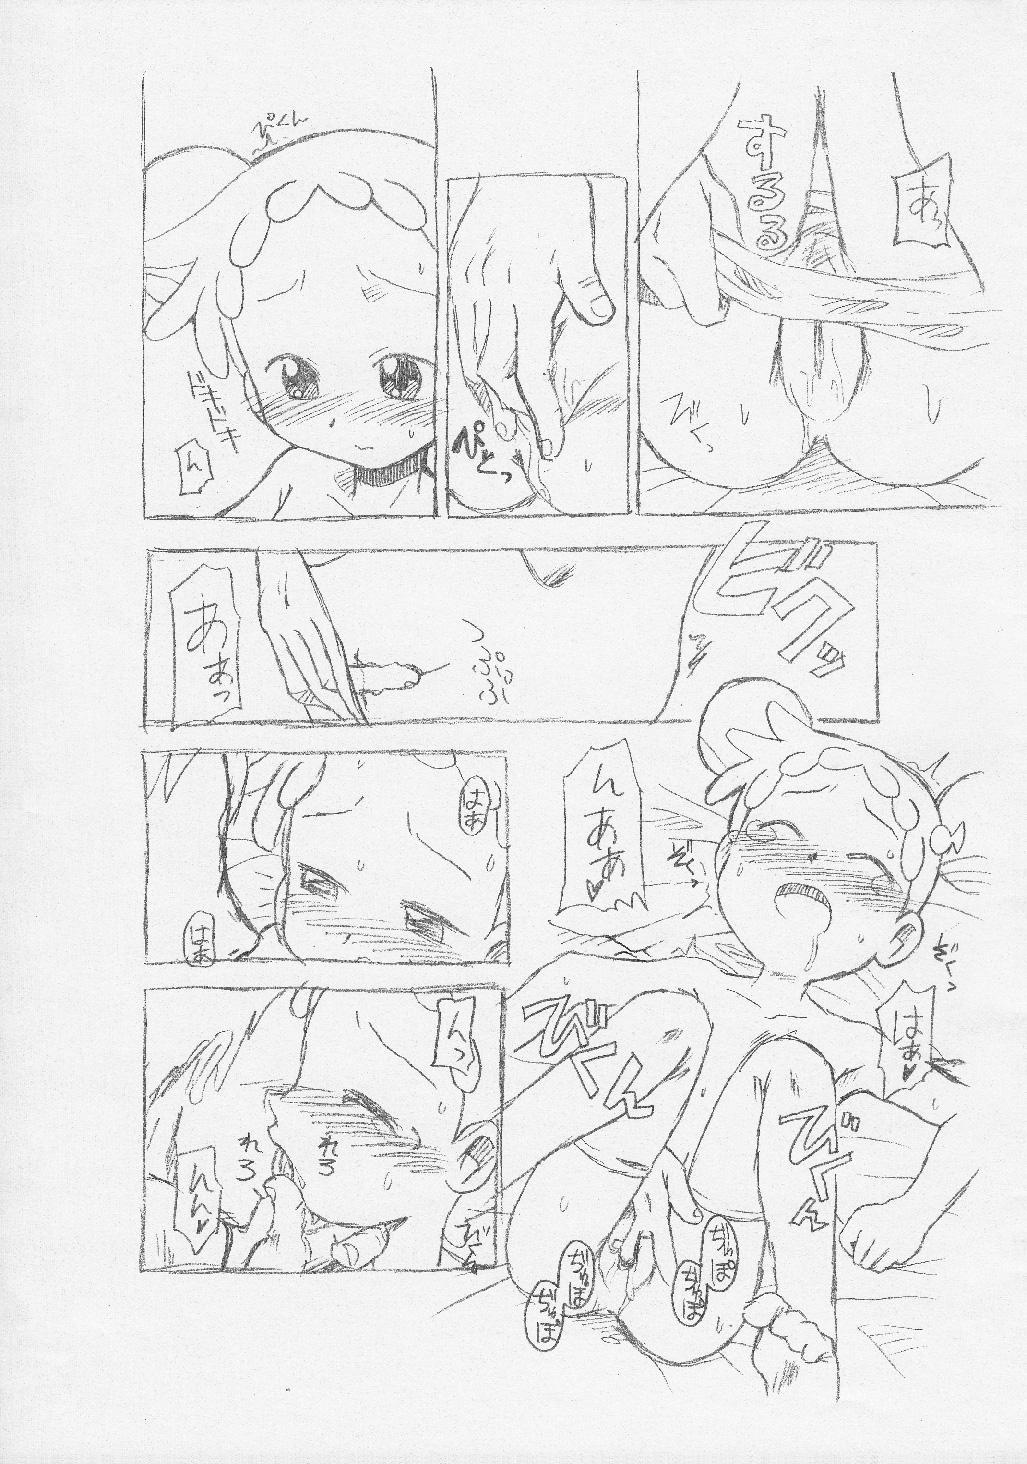 [ Okosama Pankeki (Arurukaana 7A)]Gekkan oko pan 2007-nen 8 tsuki-gō (Ojamajo Doremi) 6